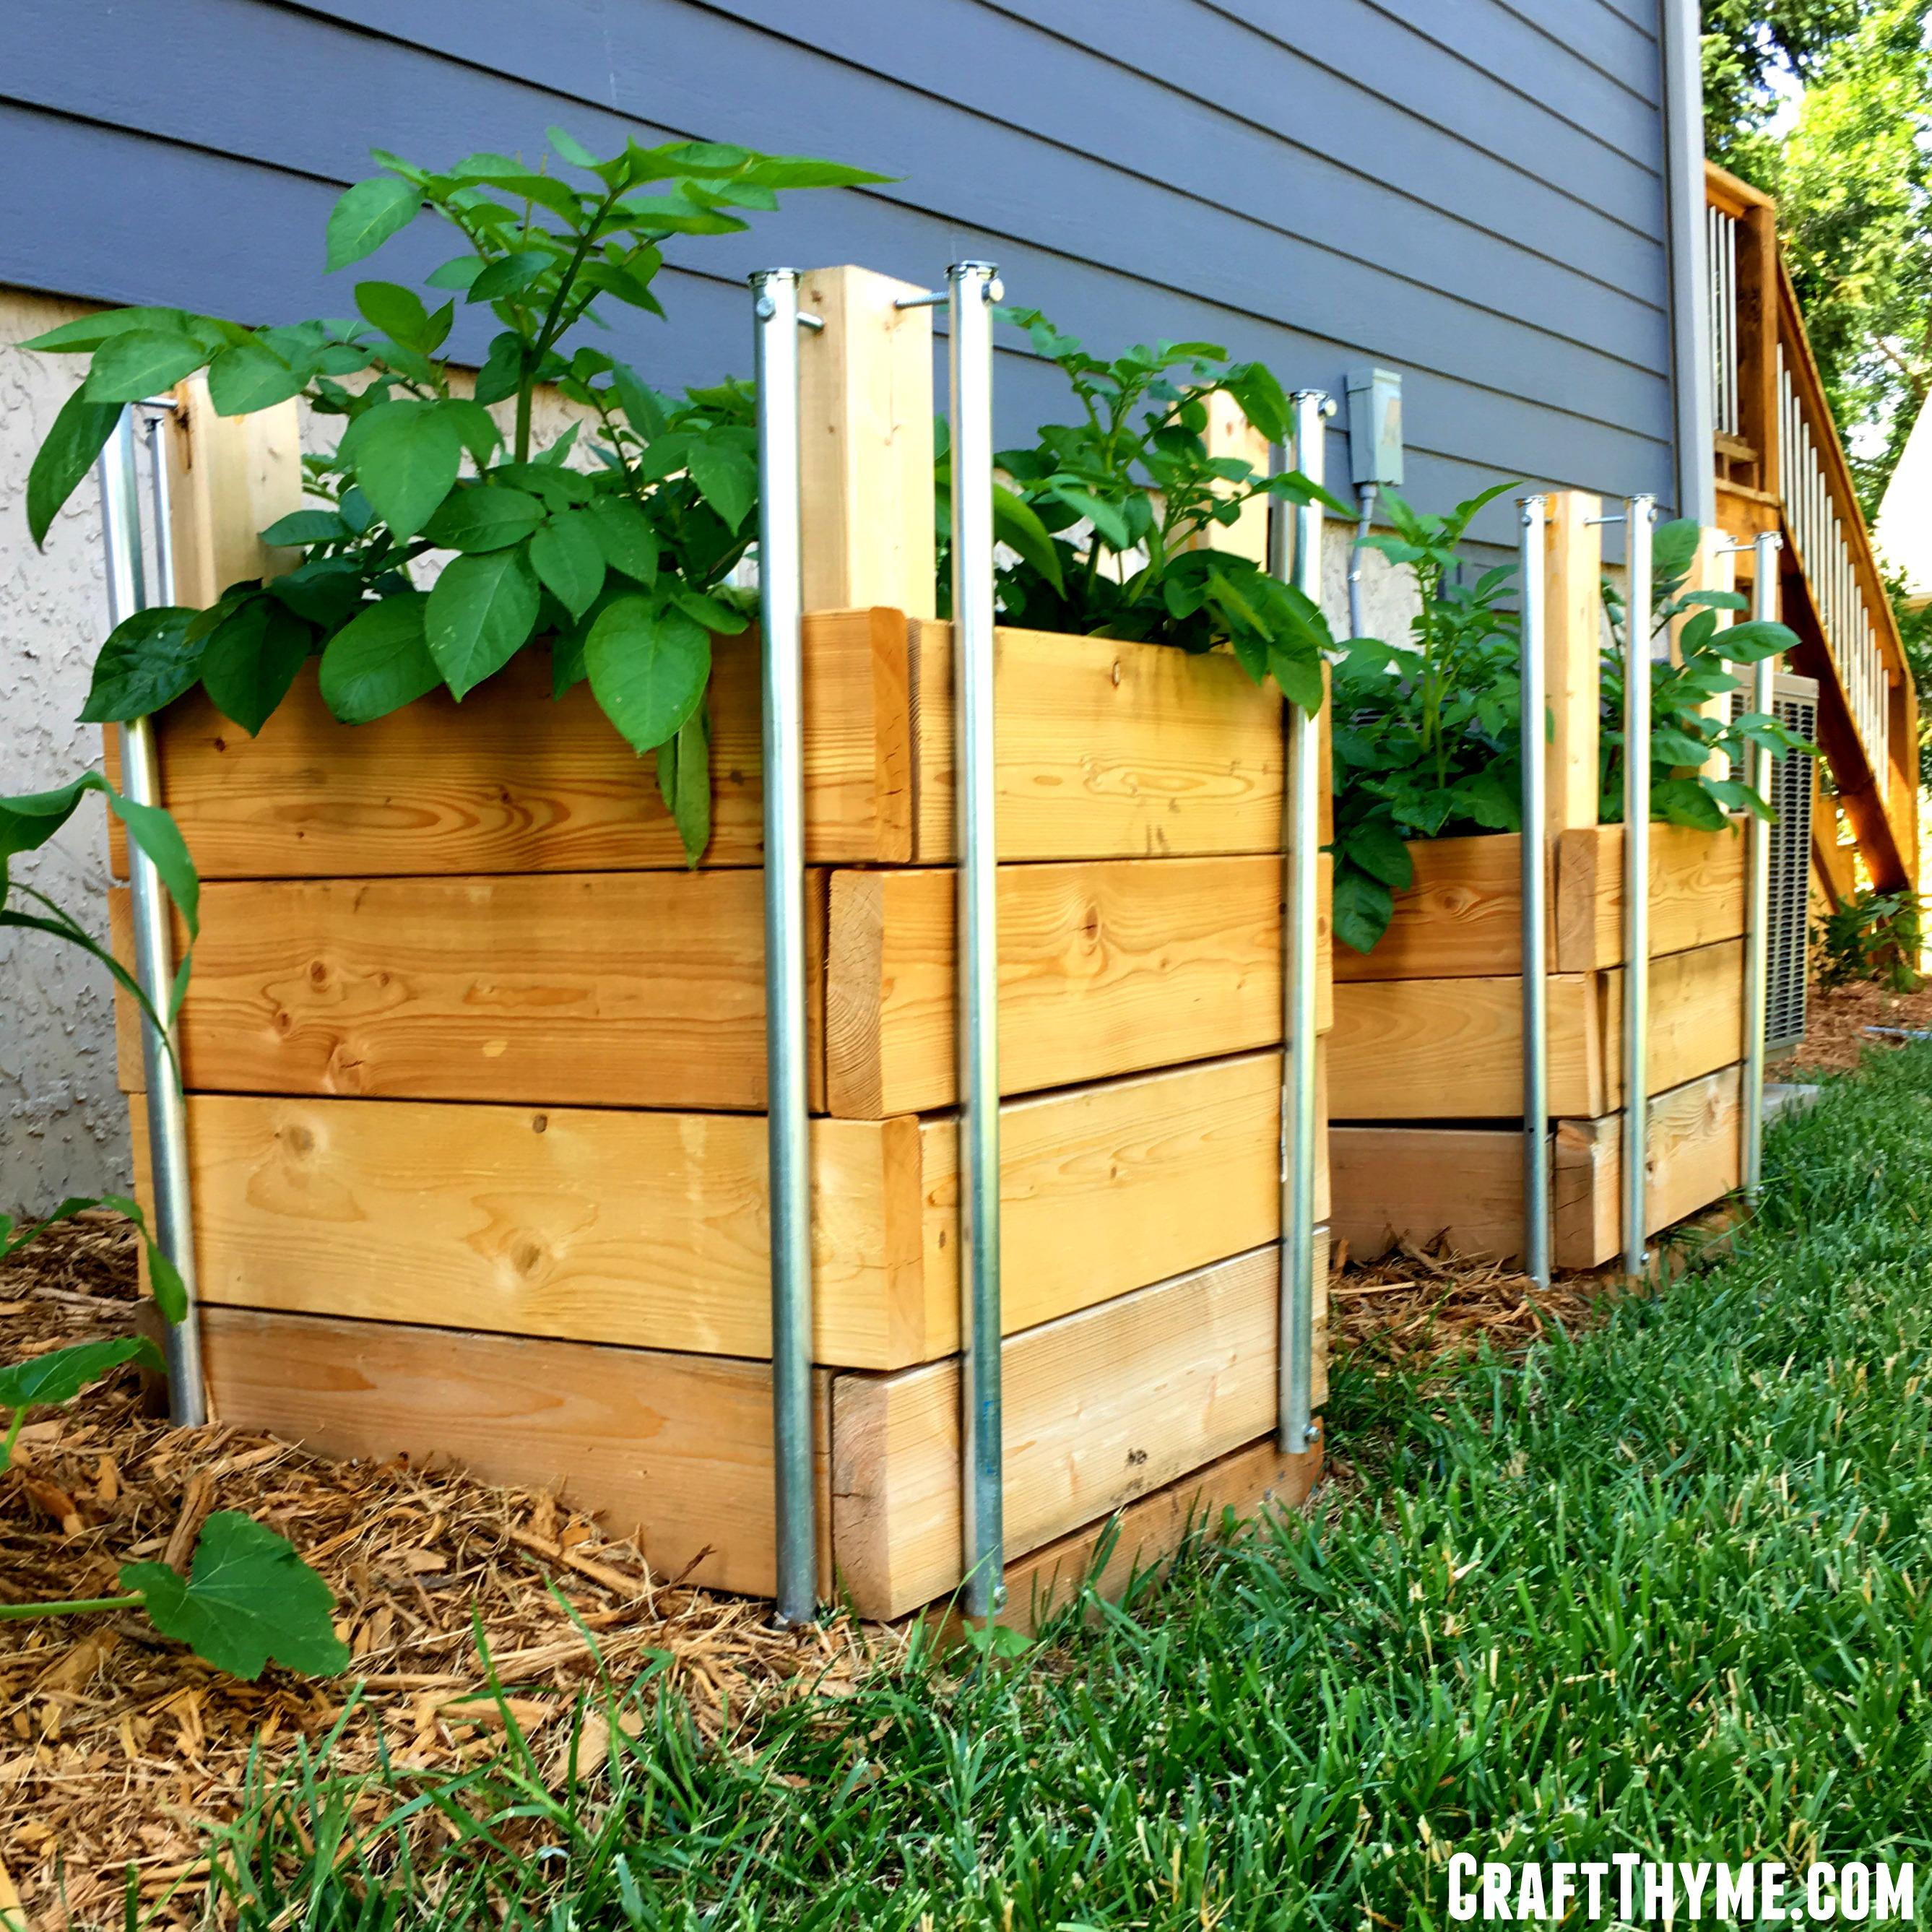 How To Build Potato Boxes Craft Thyme